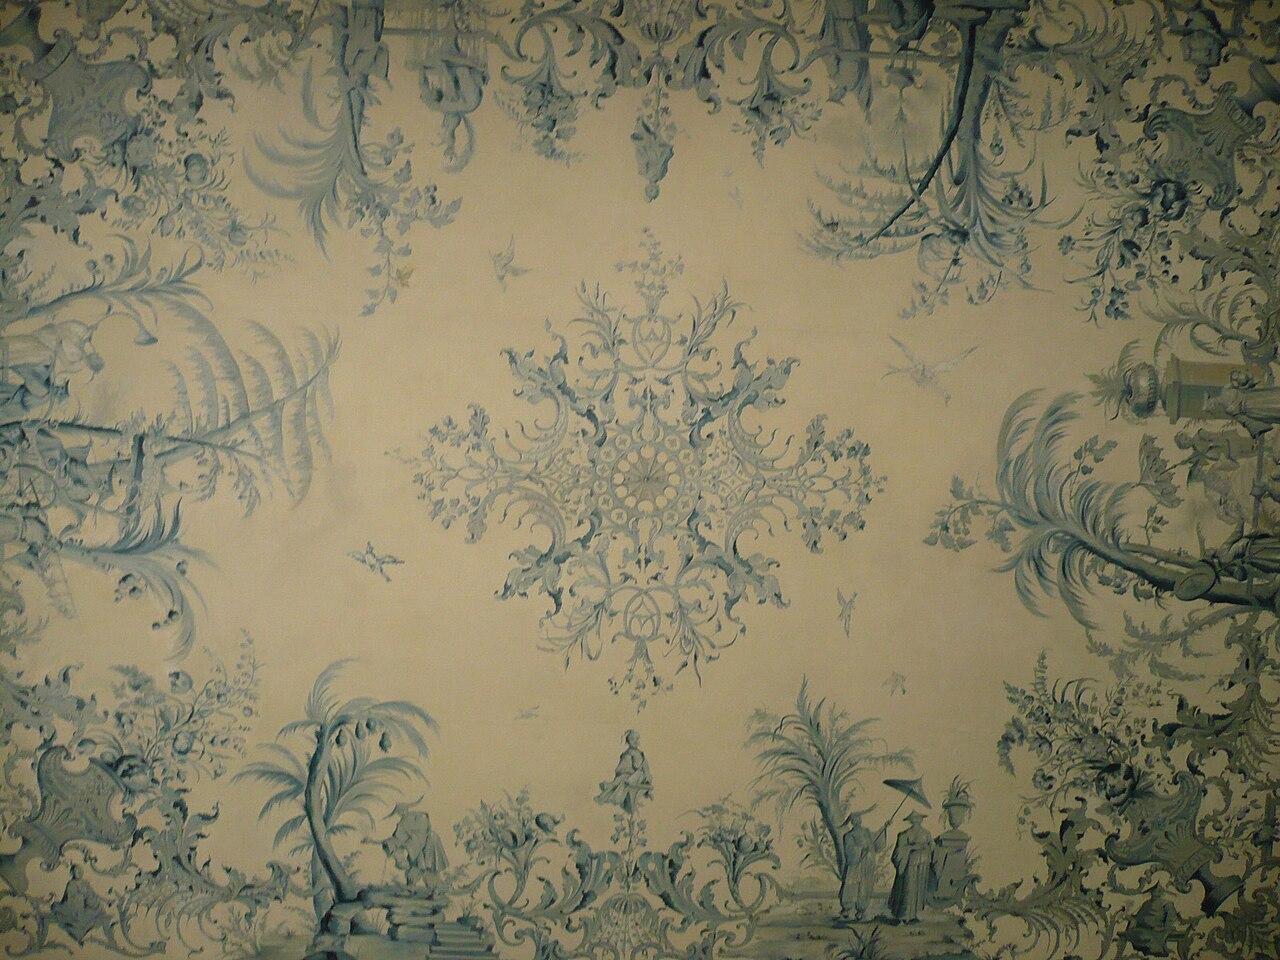 file amalienburg decke in der kueche jpg wikimedia commons. Black Bedroom Furniture Sets. Home Design Ideas